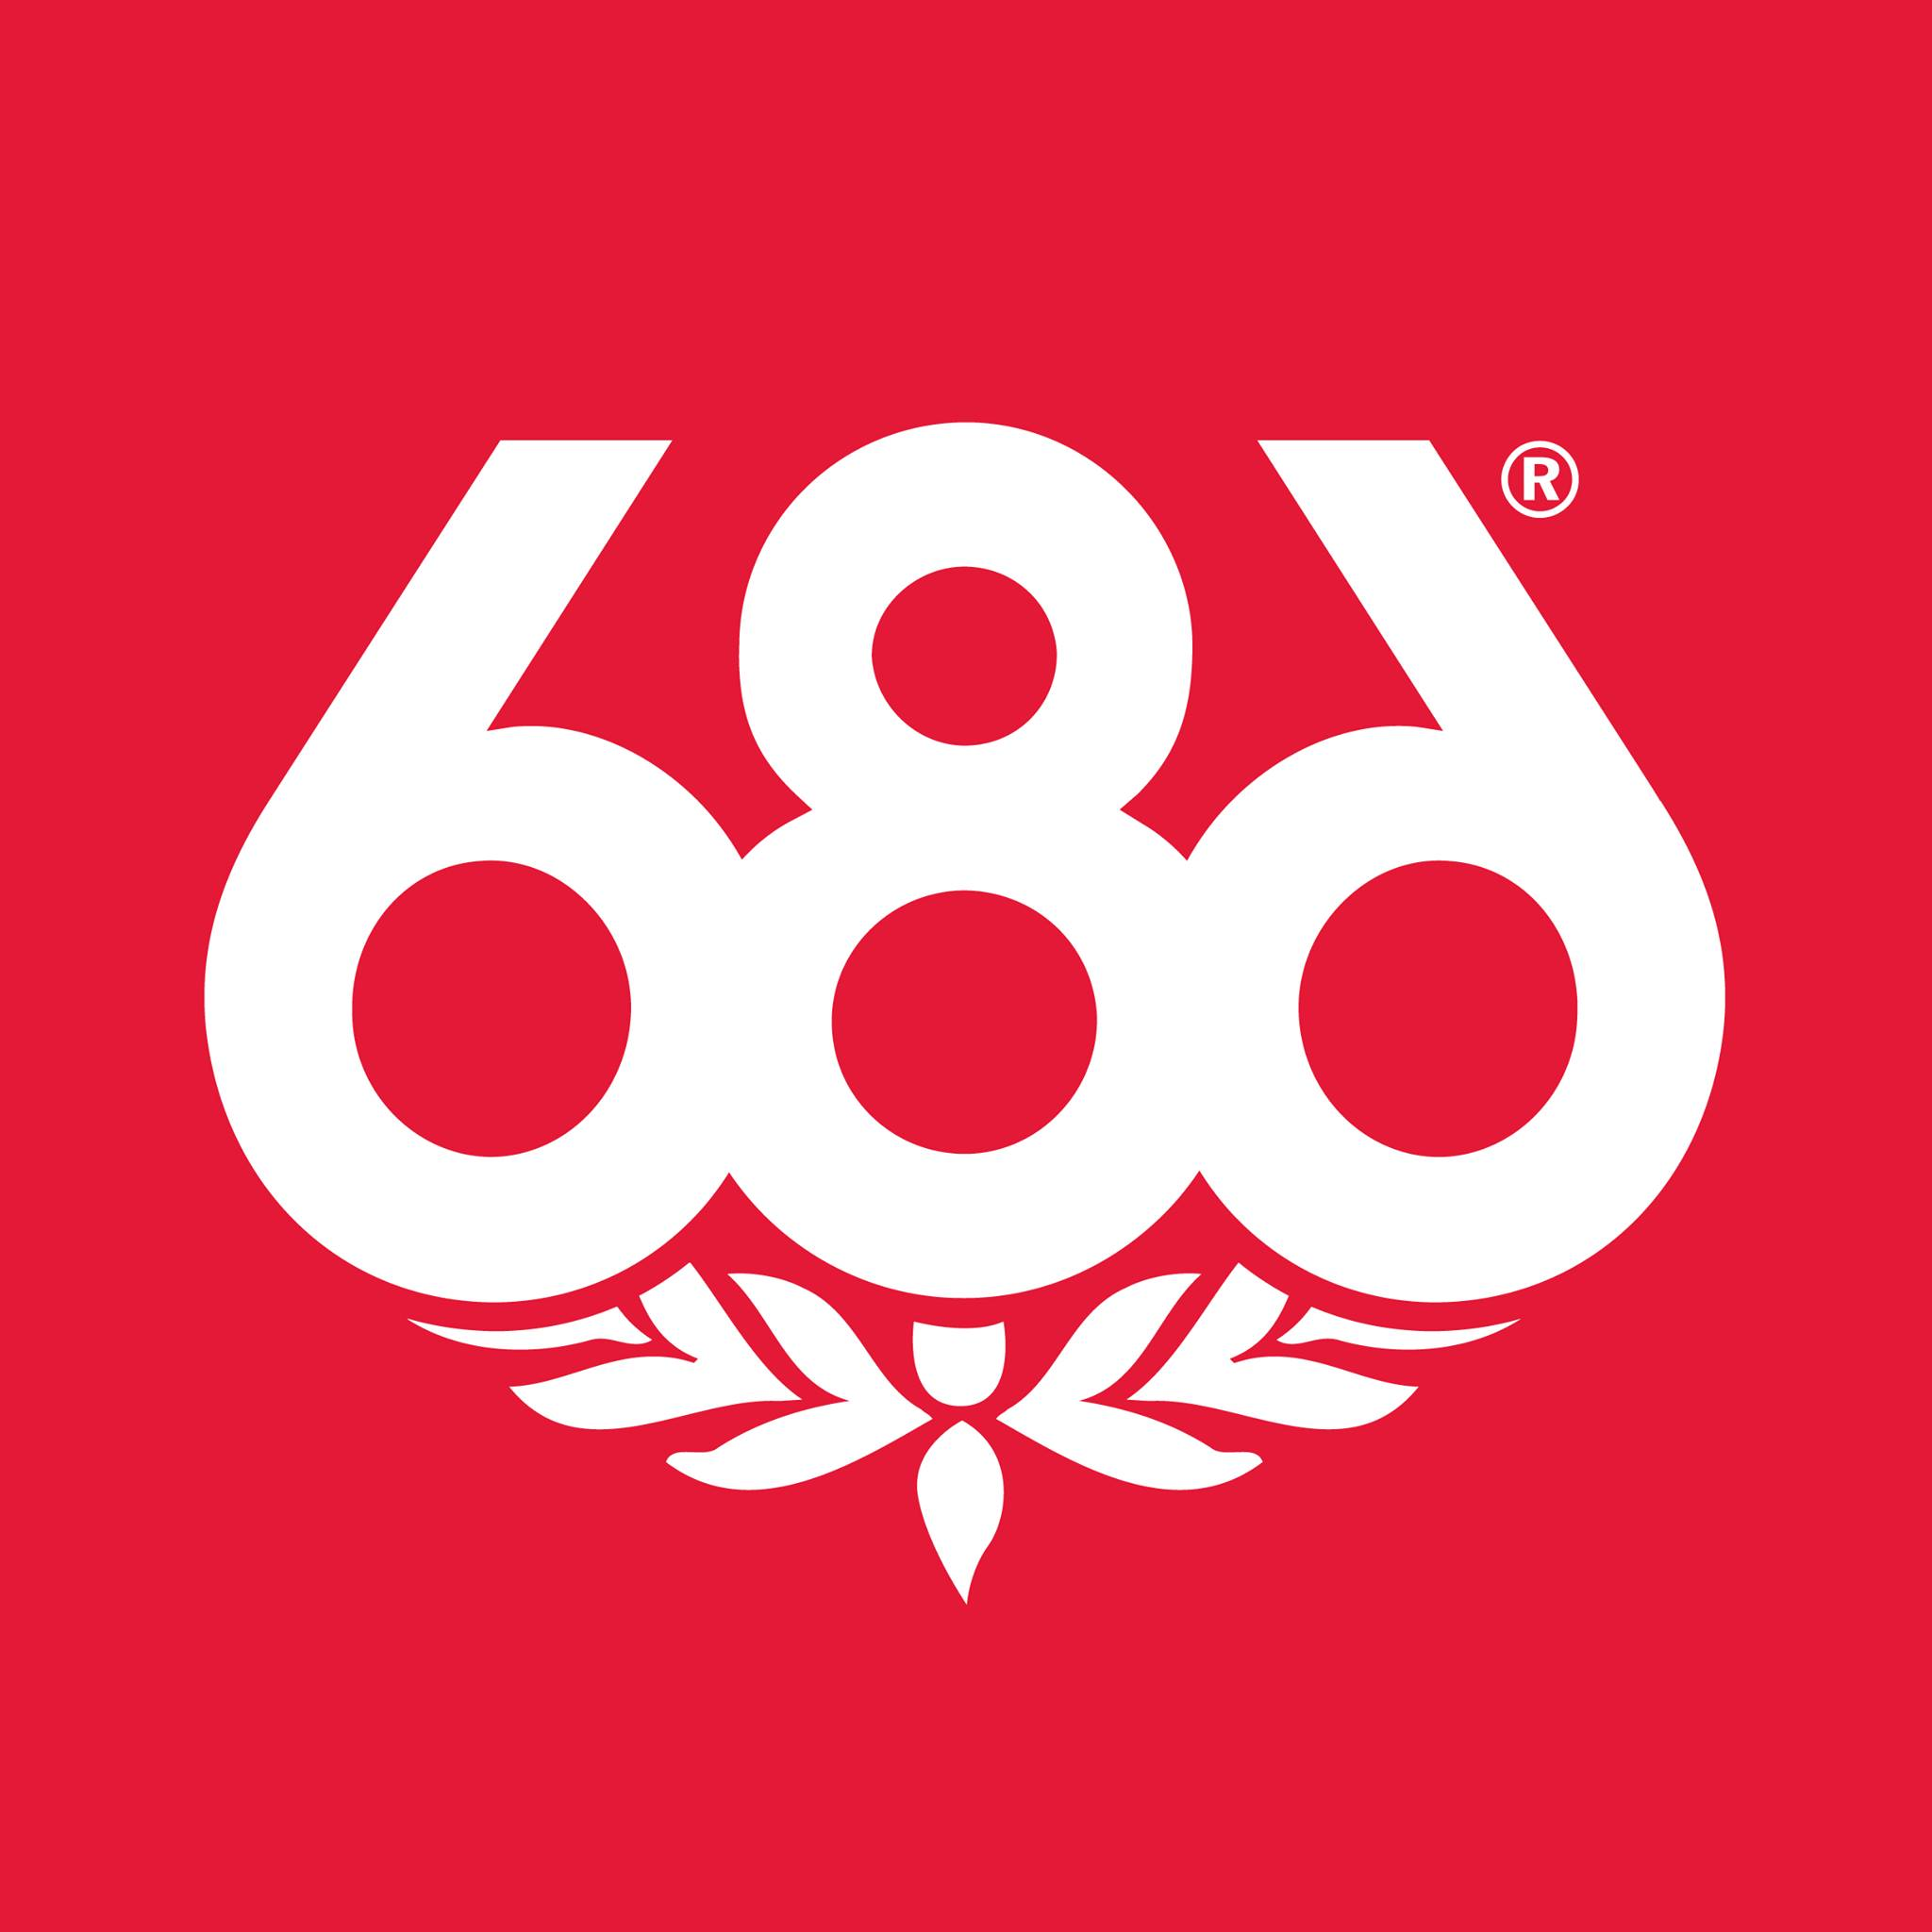 686 coupon codes